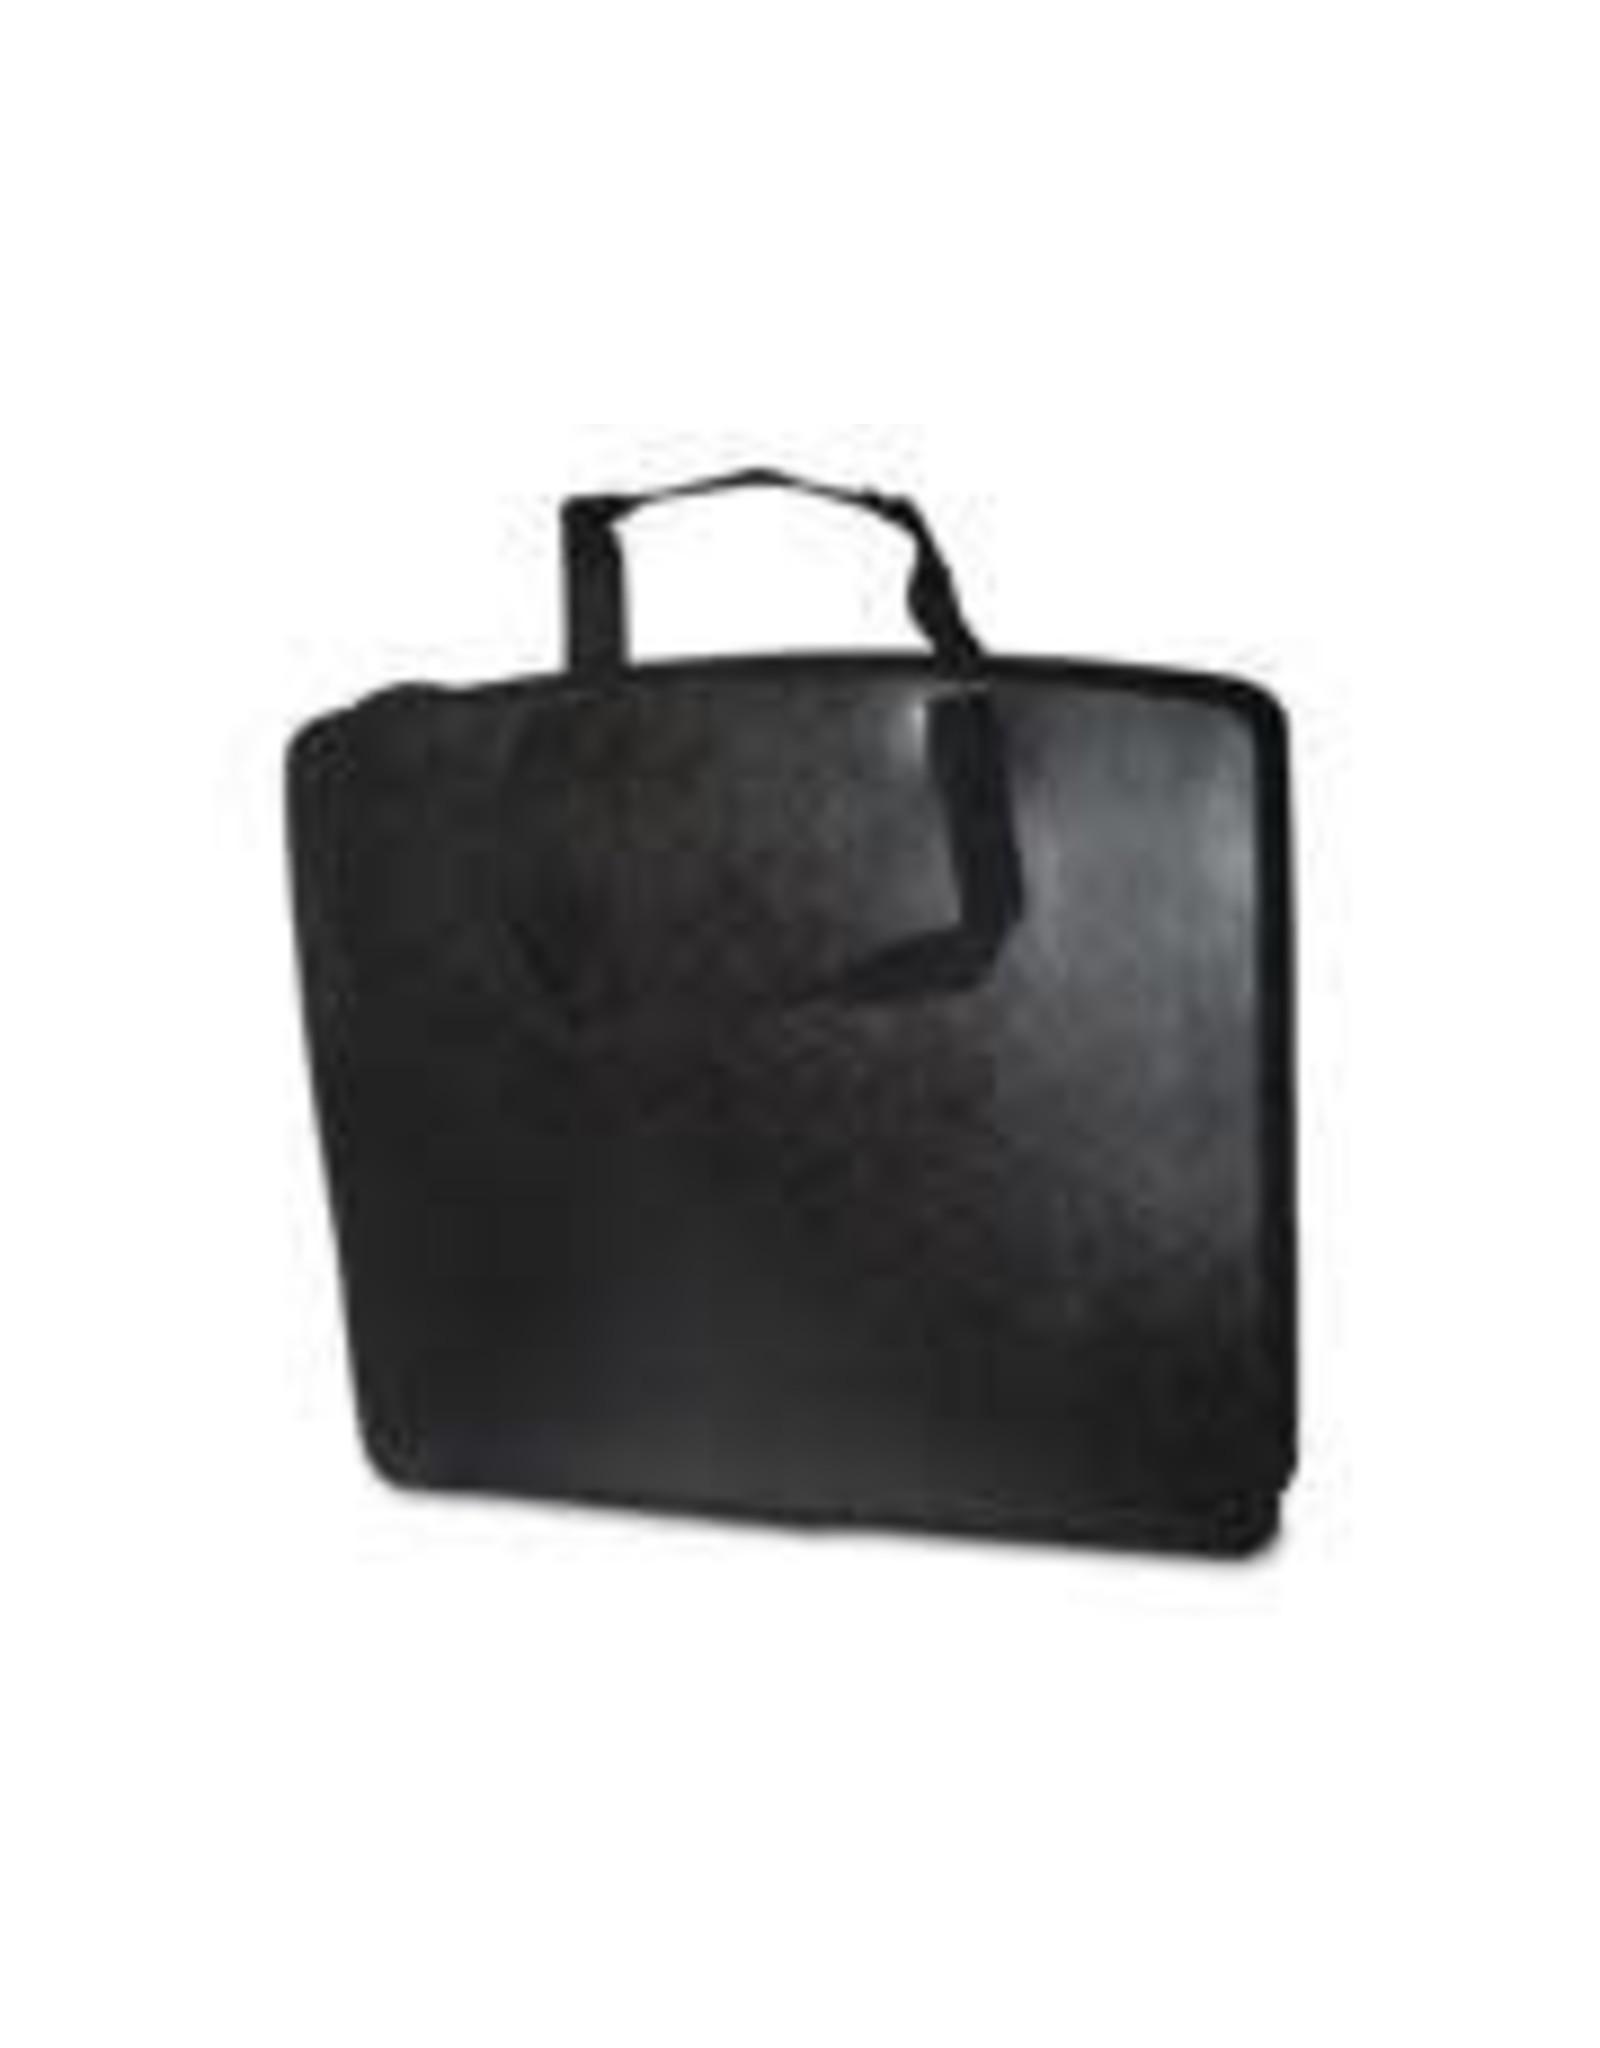 VLB Marketing ARTIST CARRY-ALL CASE 21X27X4'' BLACK